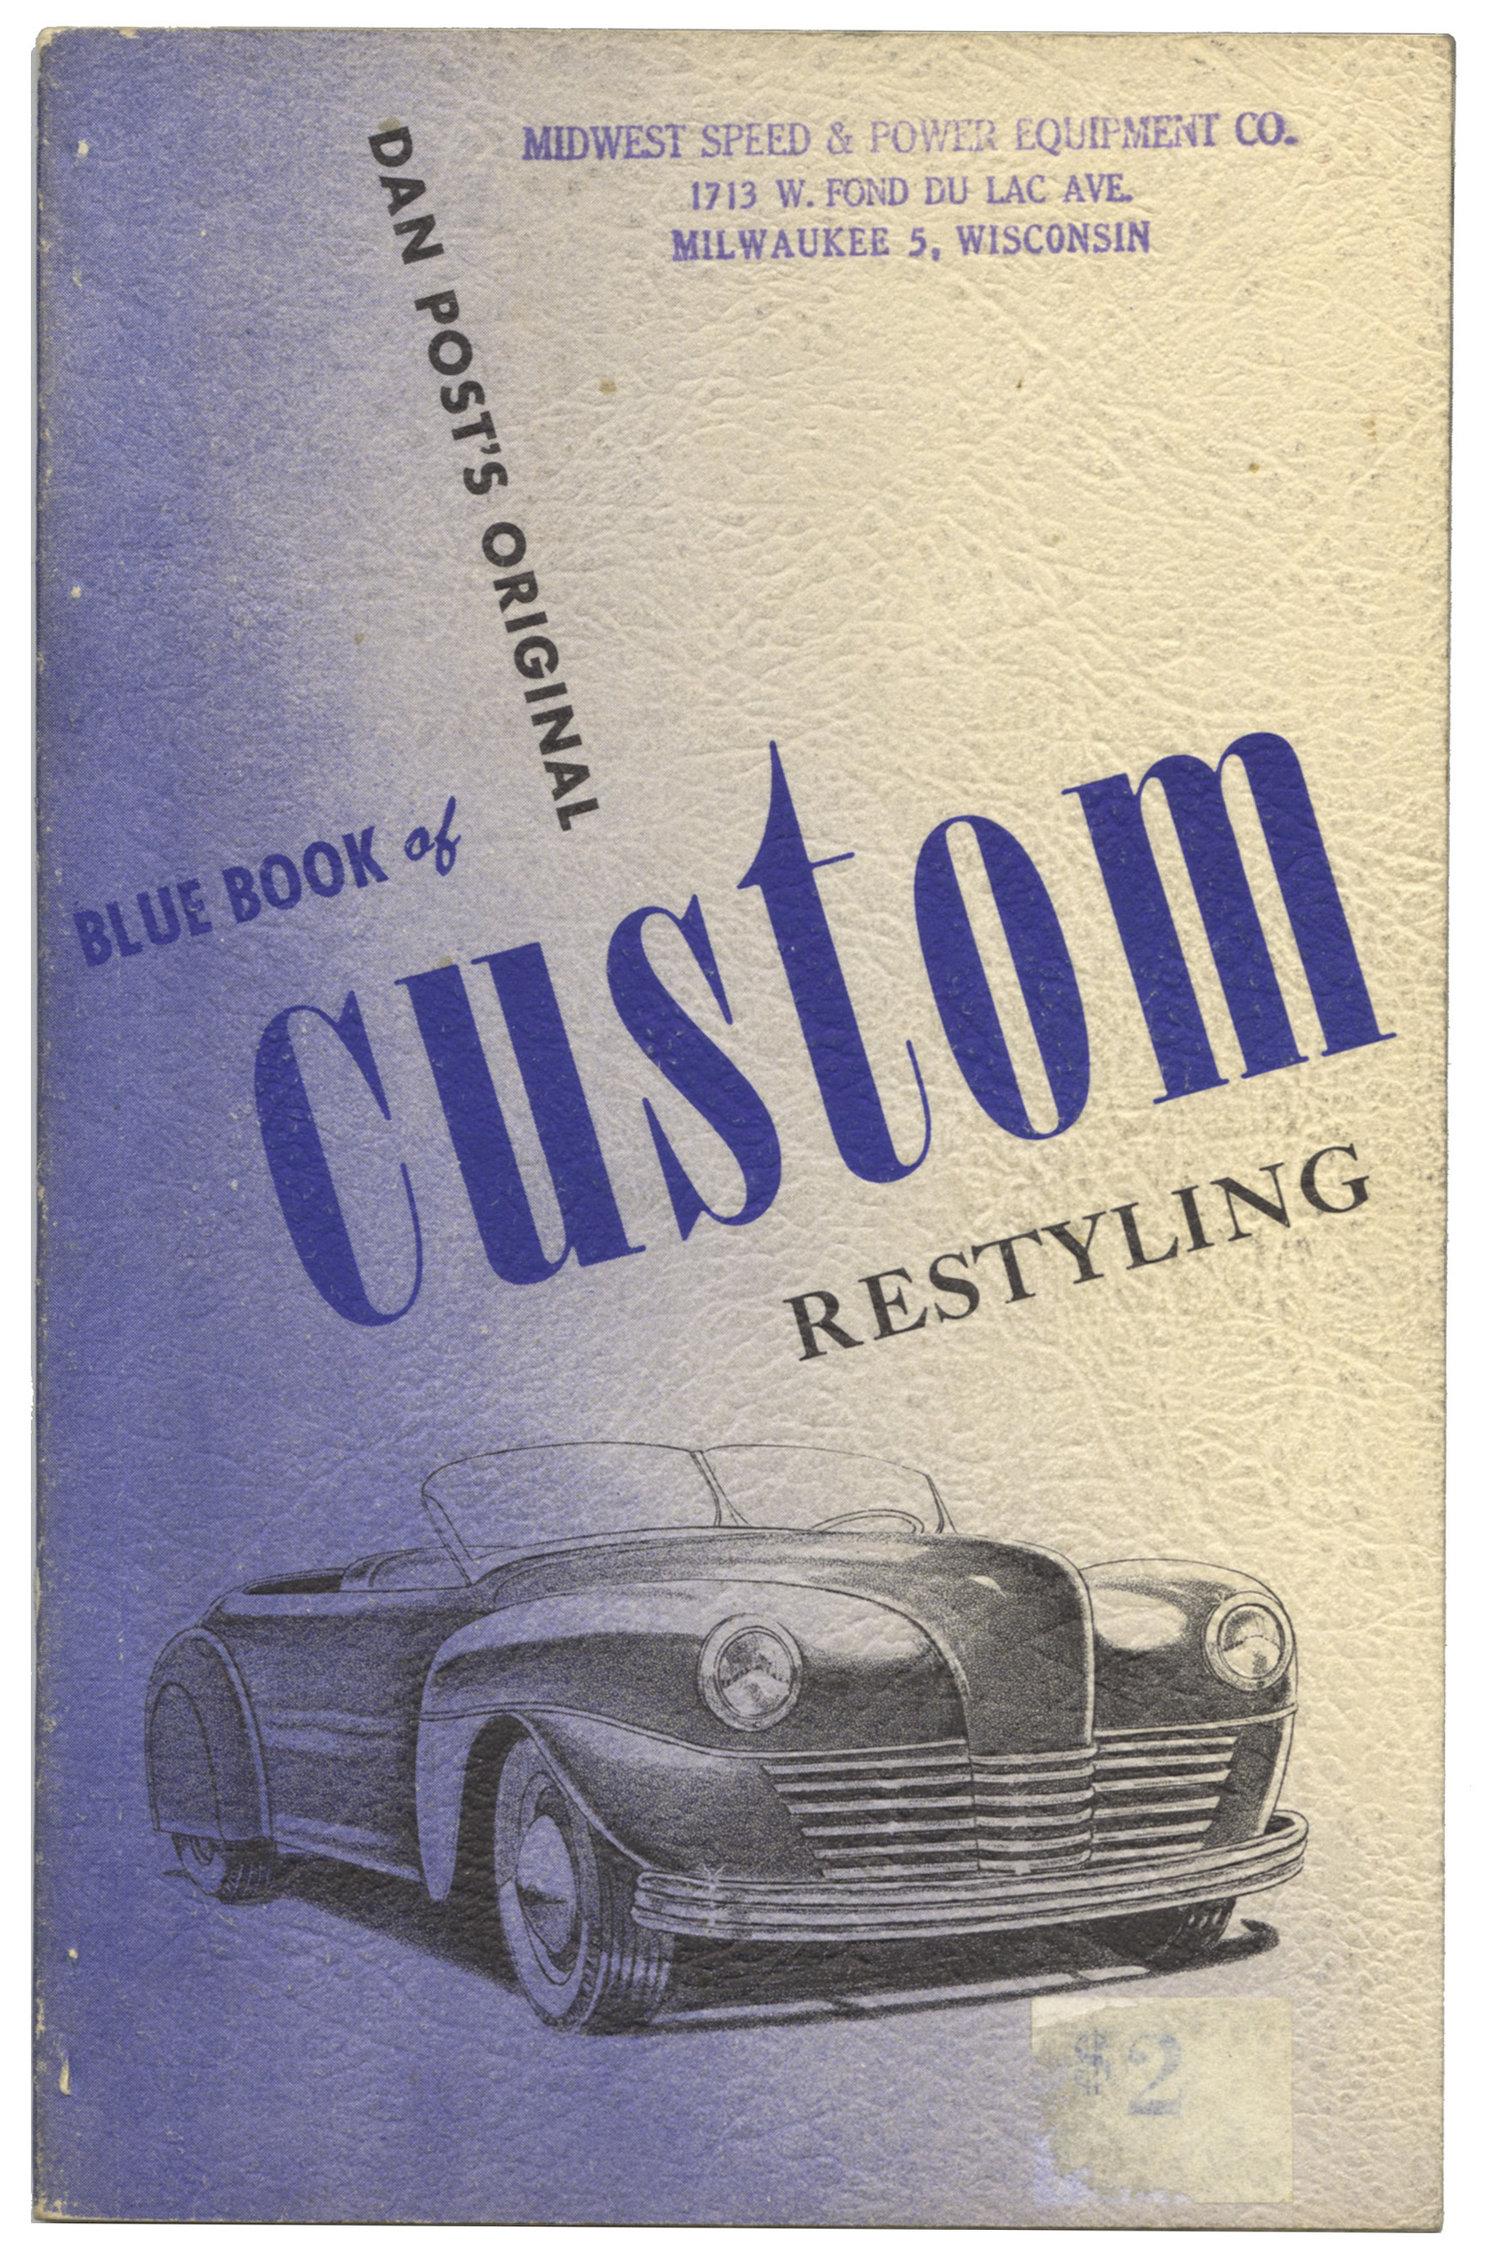 BLUE BOOK OF CUSTOM RESTYLING — Martin Hartzold, bookseller